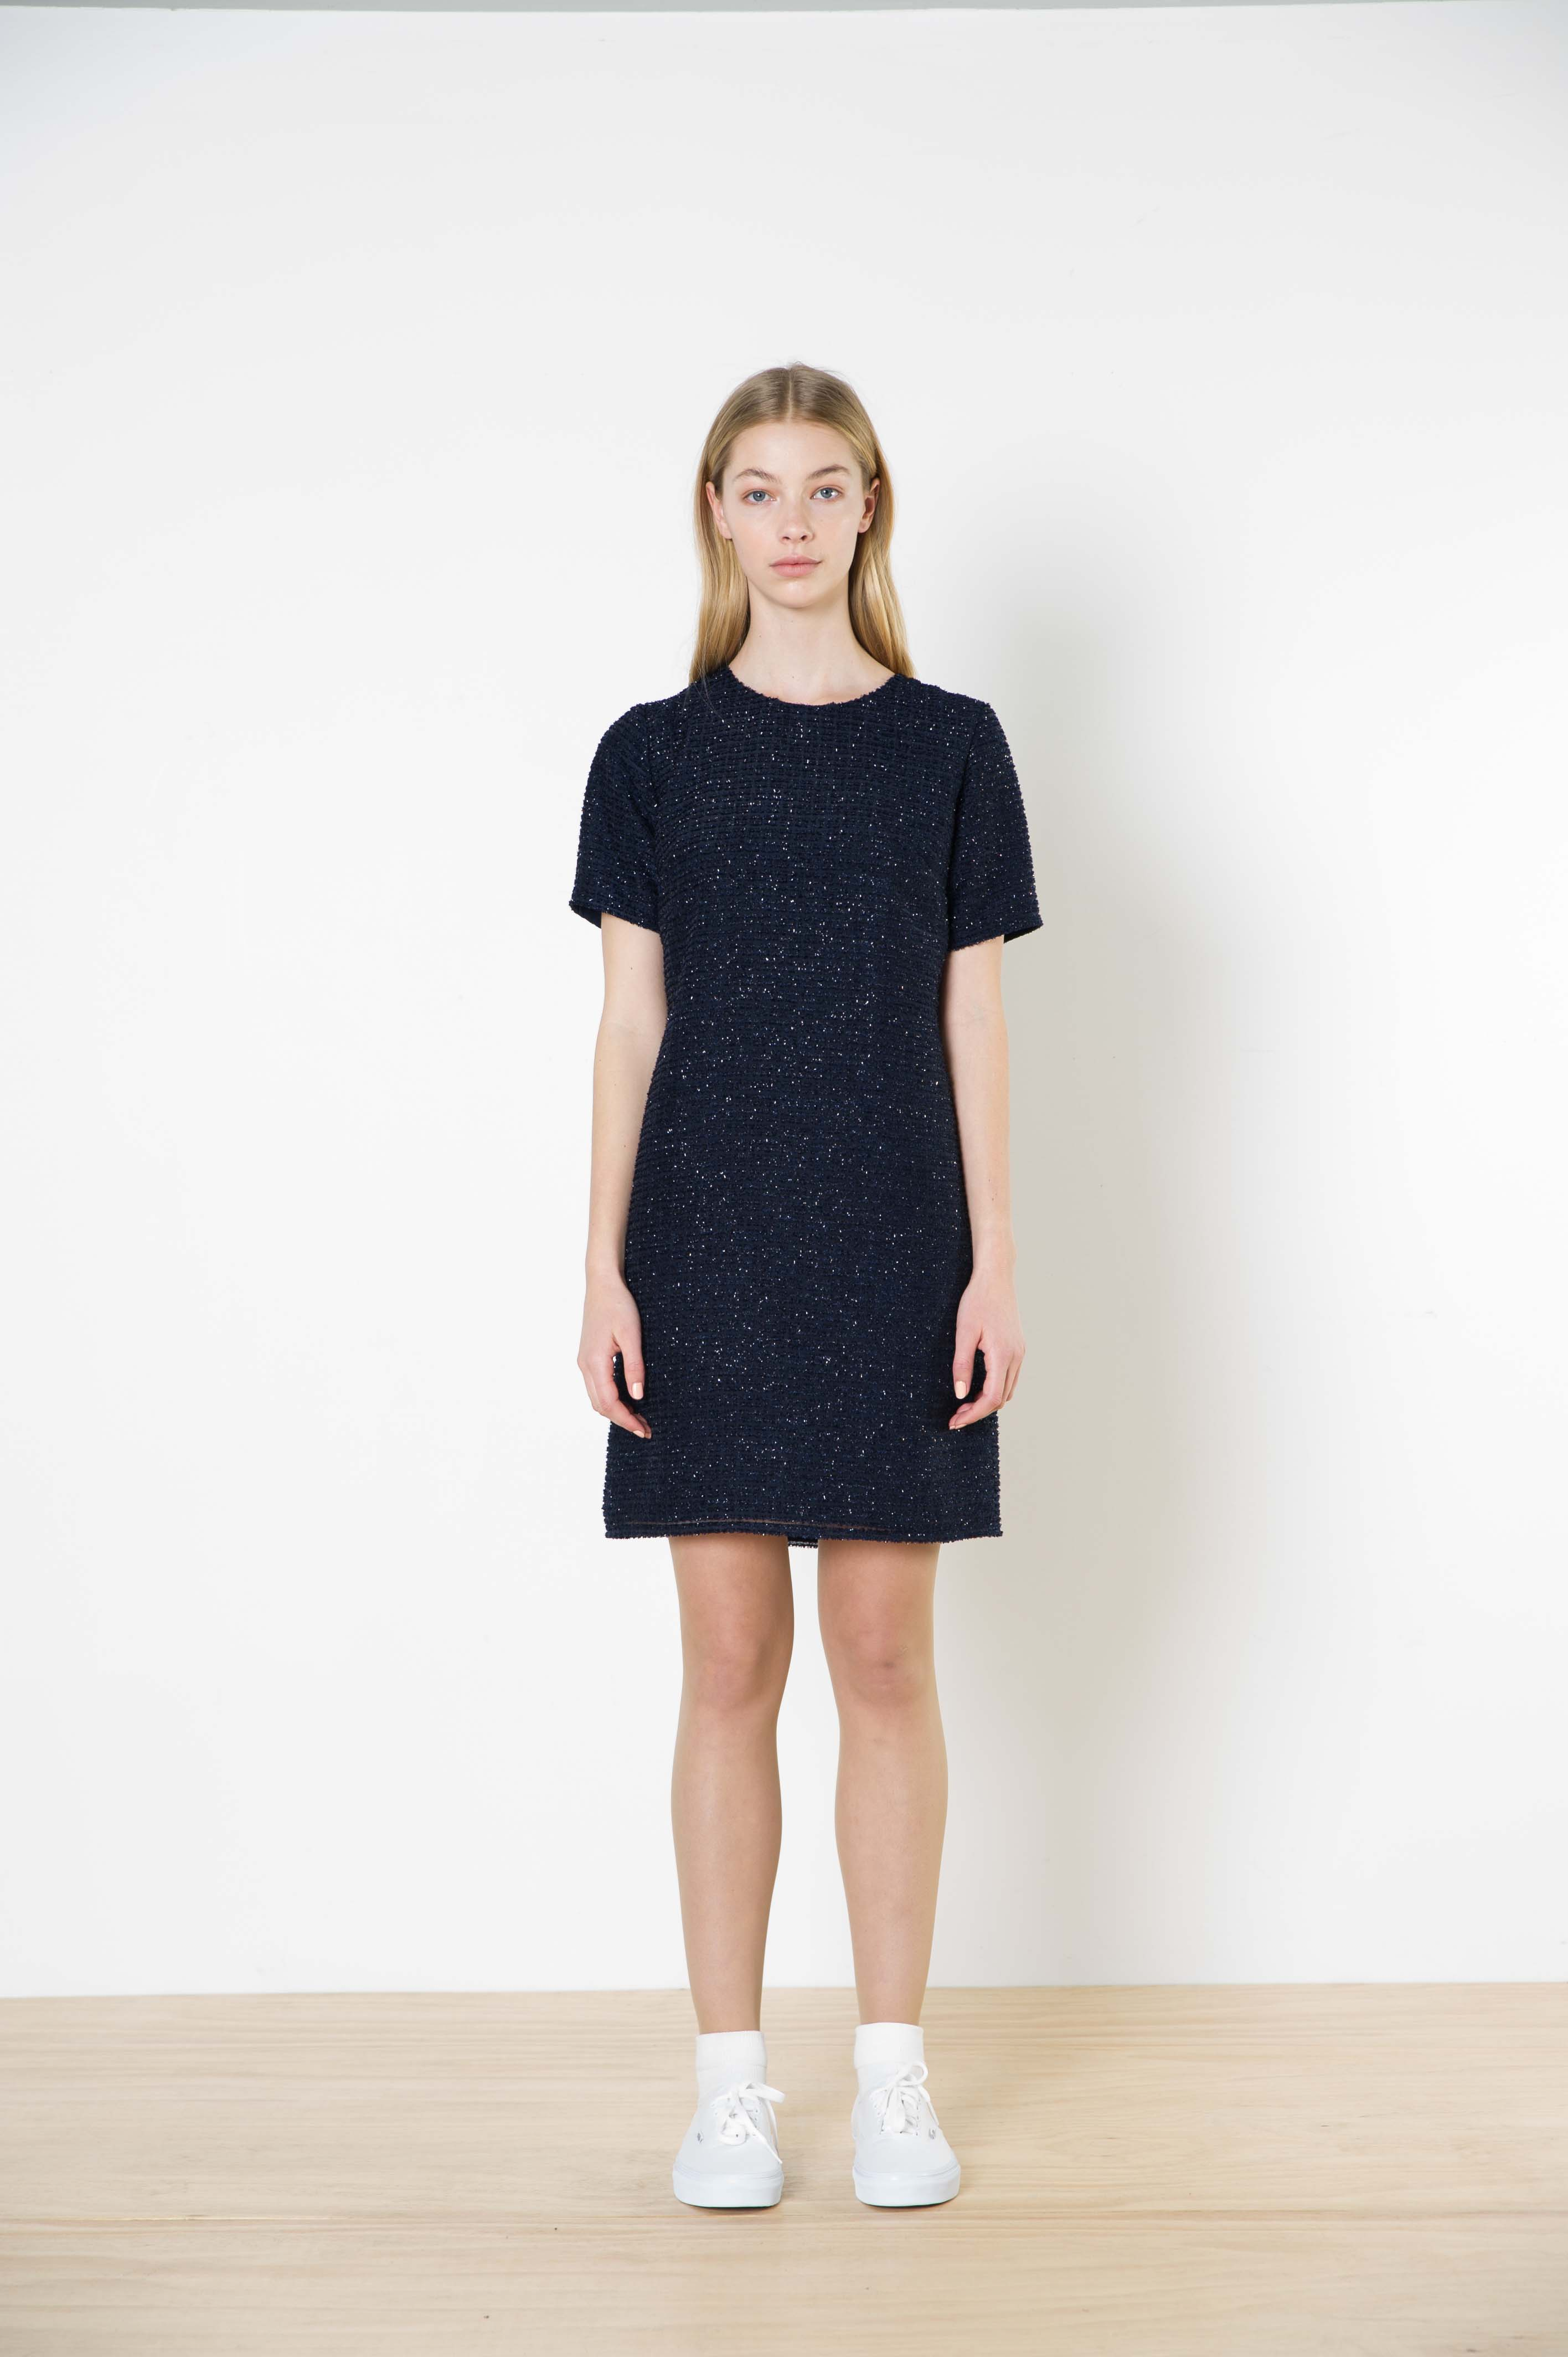 64 elenor dress